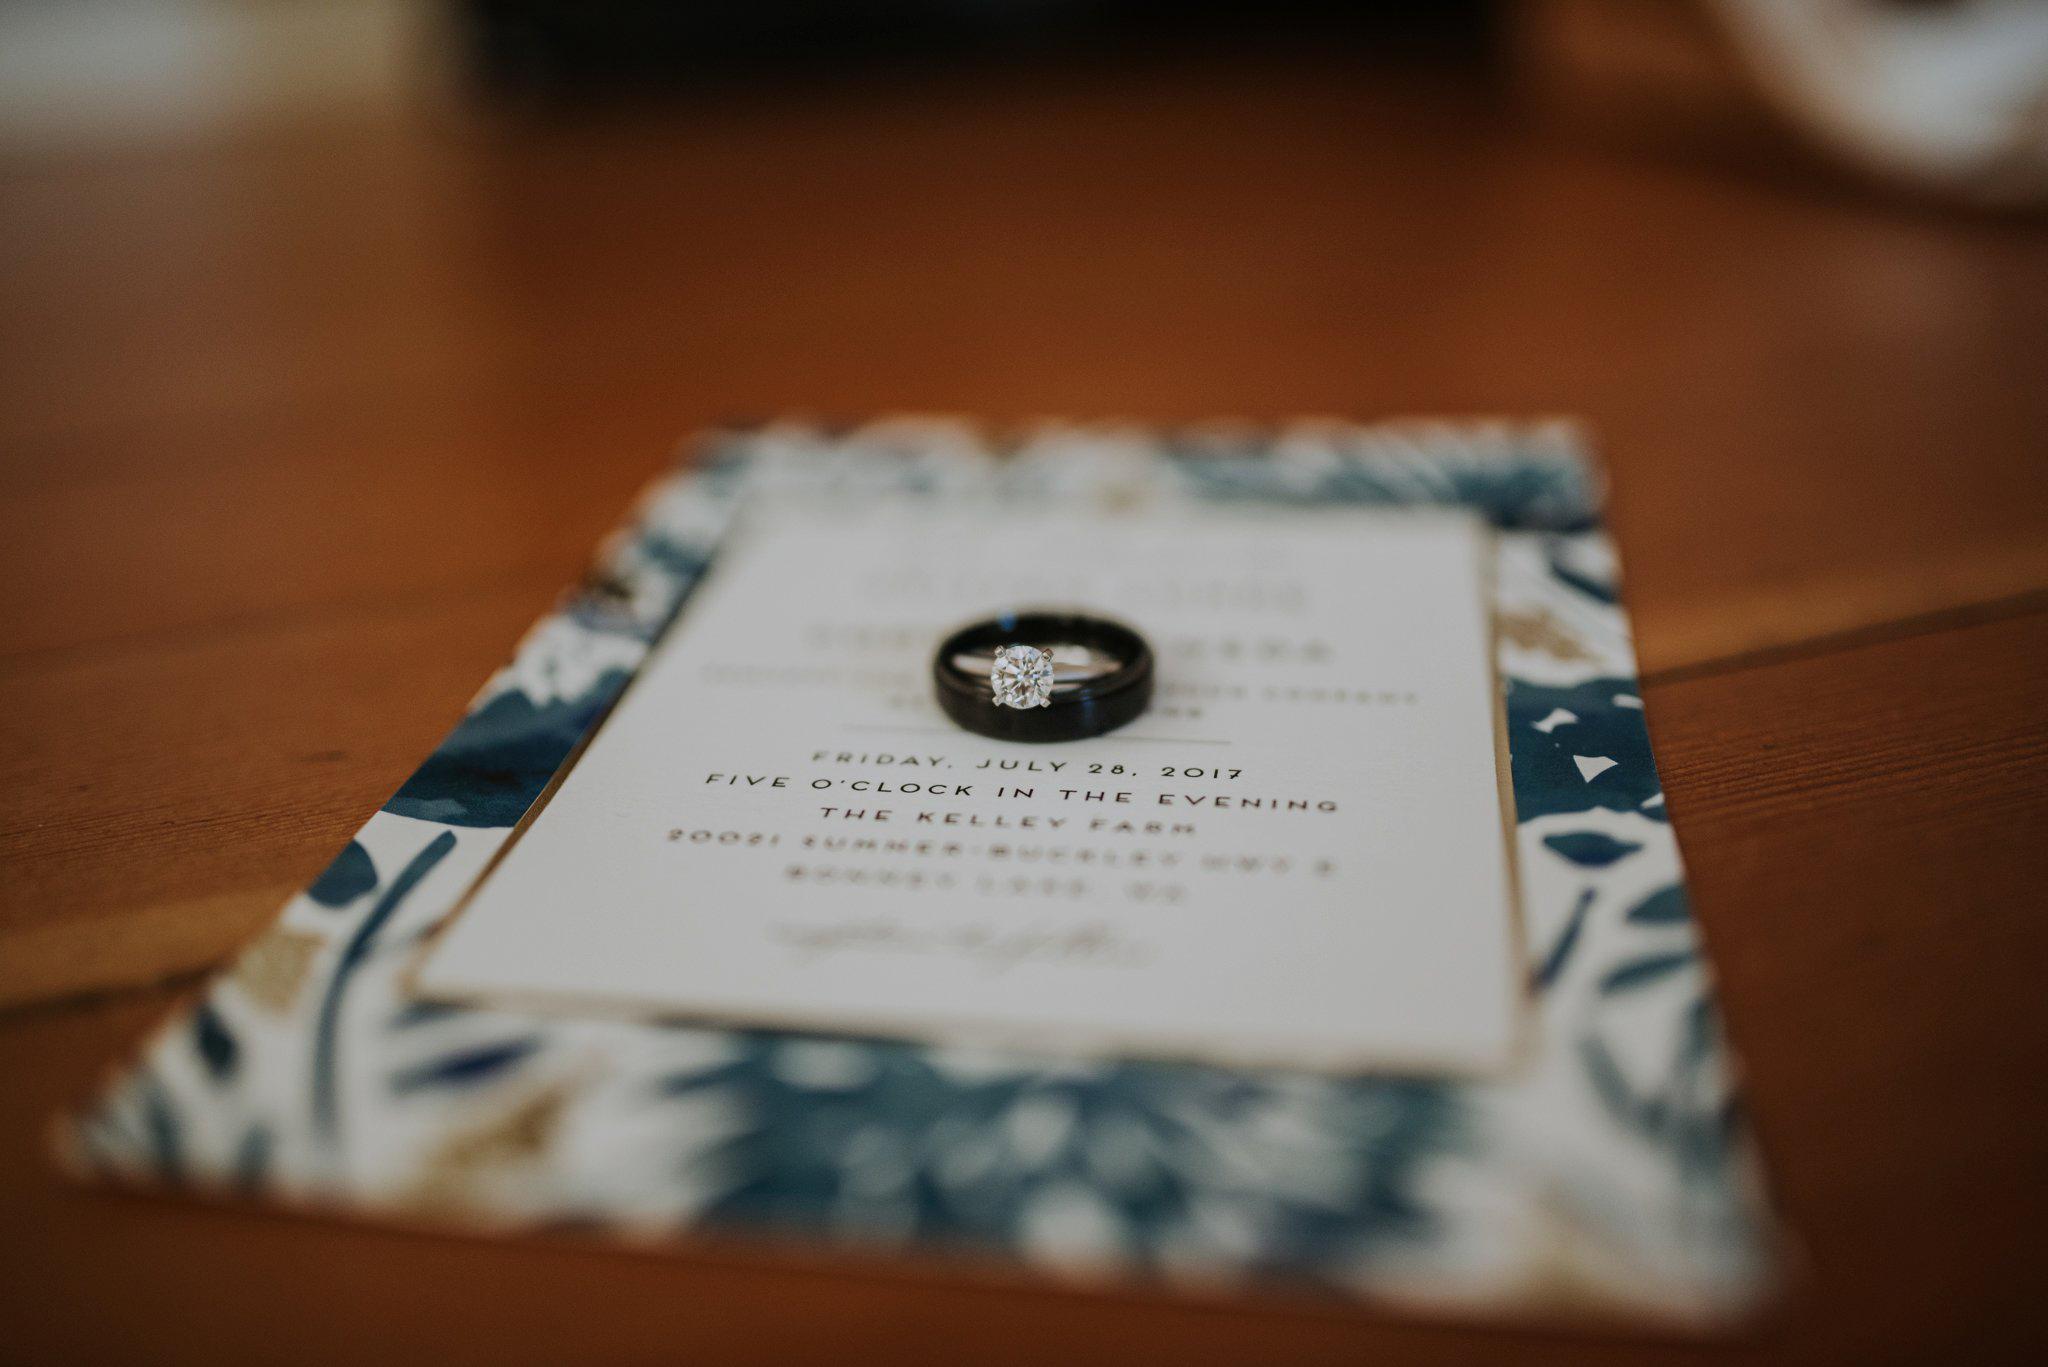 kristen-and-cody-the-kelley-farm-wedding-seattle-photographer-caitlyn-nikula-6.jpg